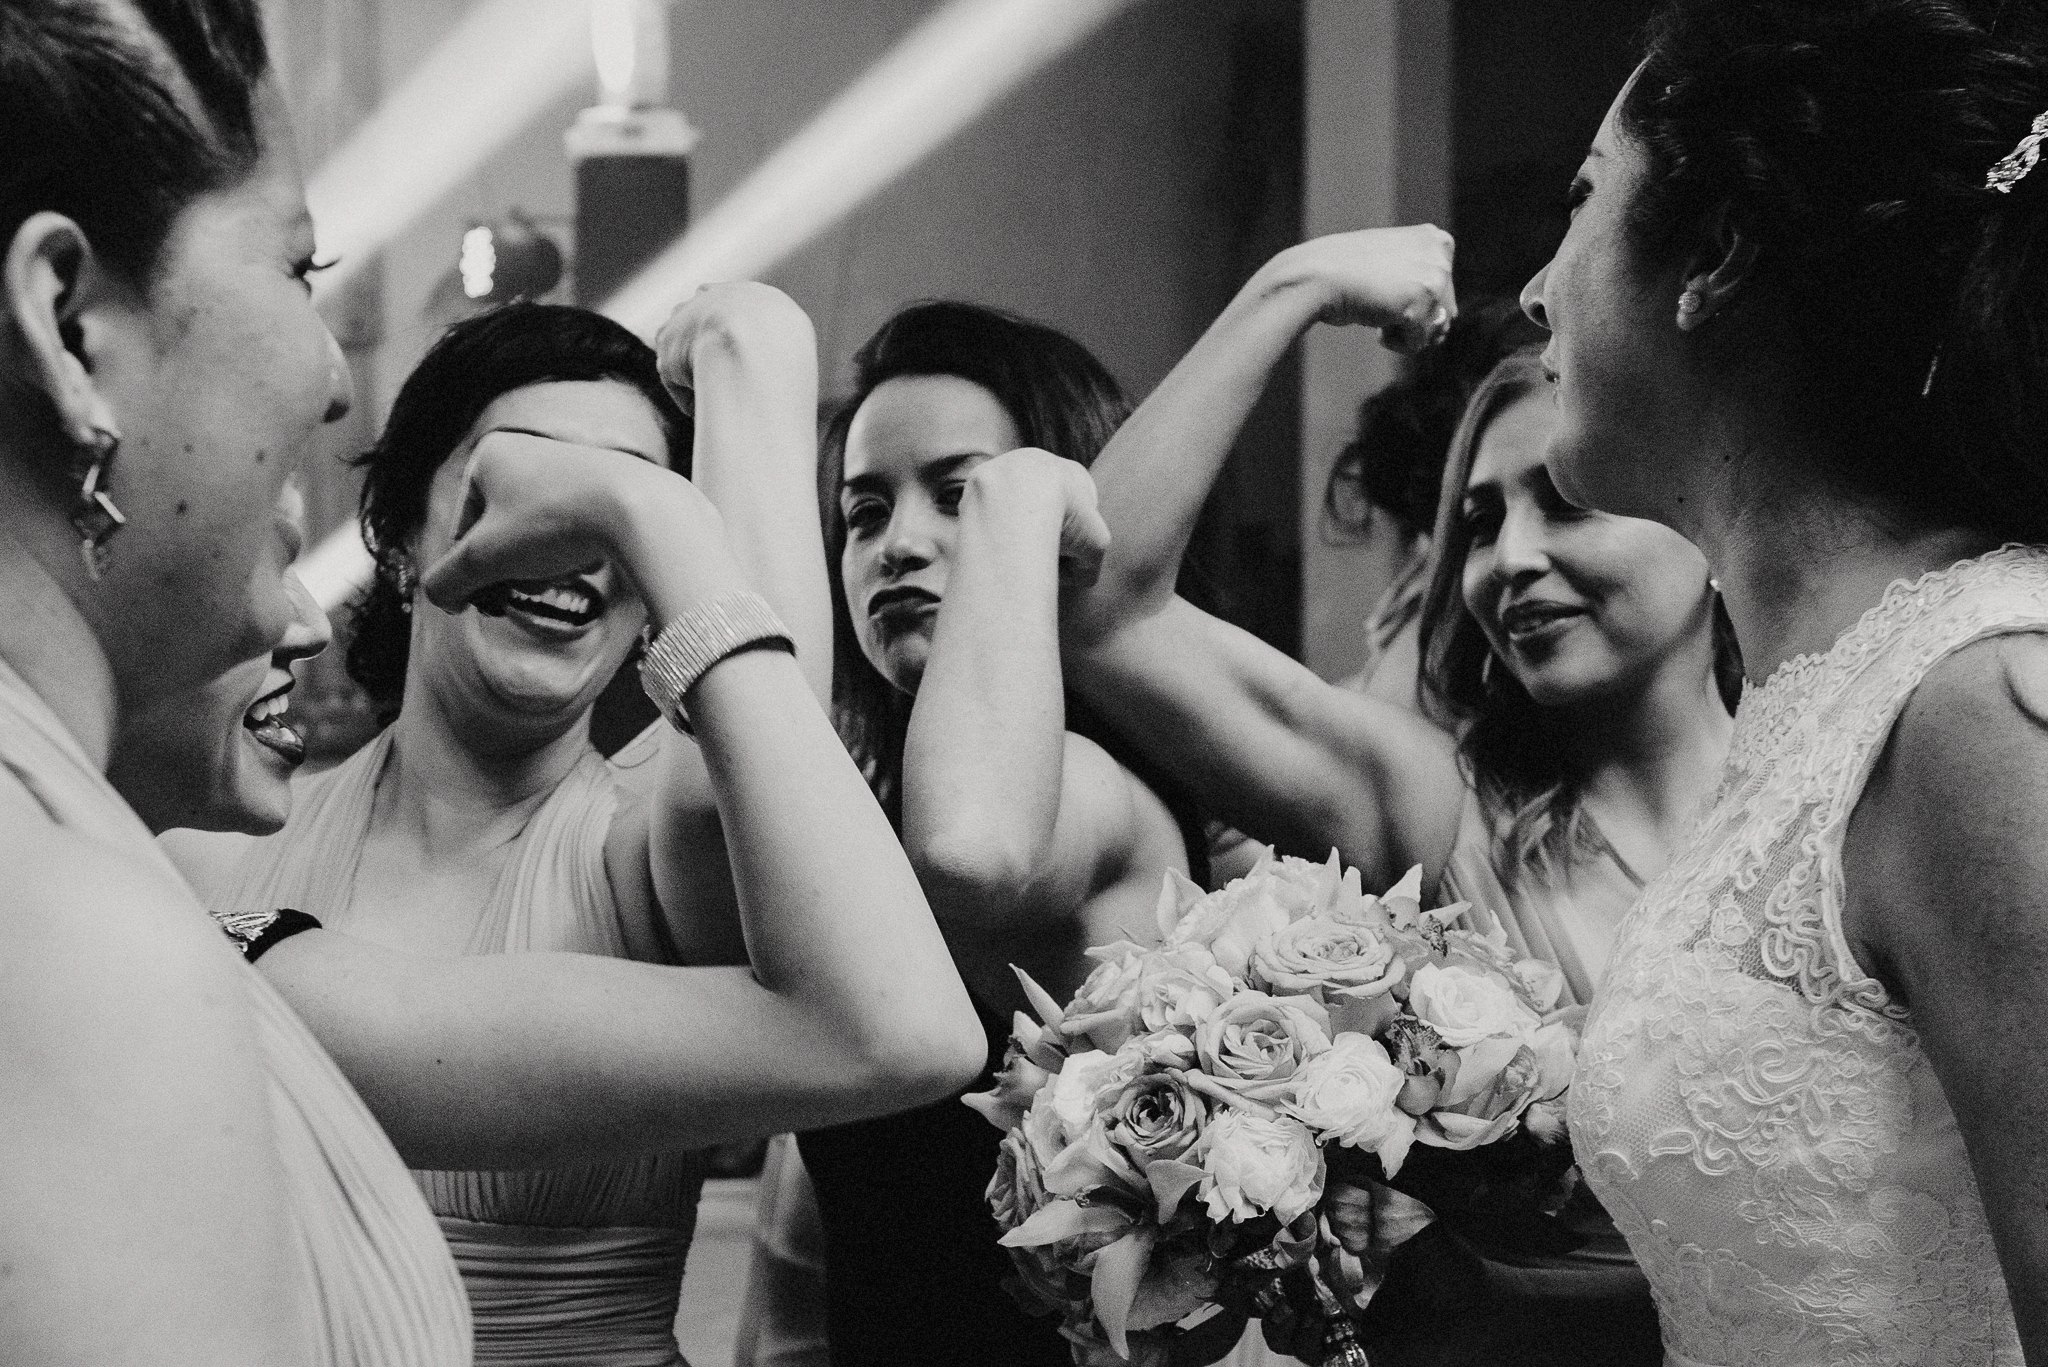 Wedding-Boda-Tulancingo-Hidalgo-Salon-Essenzia-Luis-Houdin-58-film